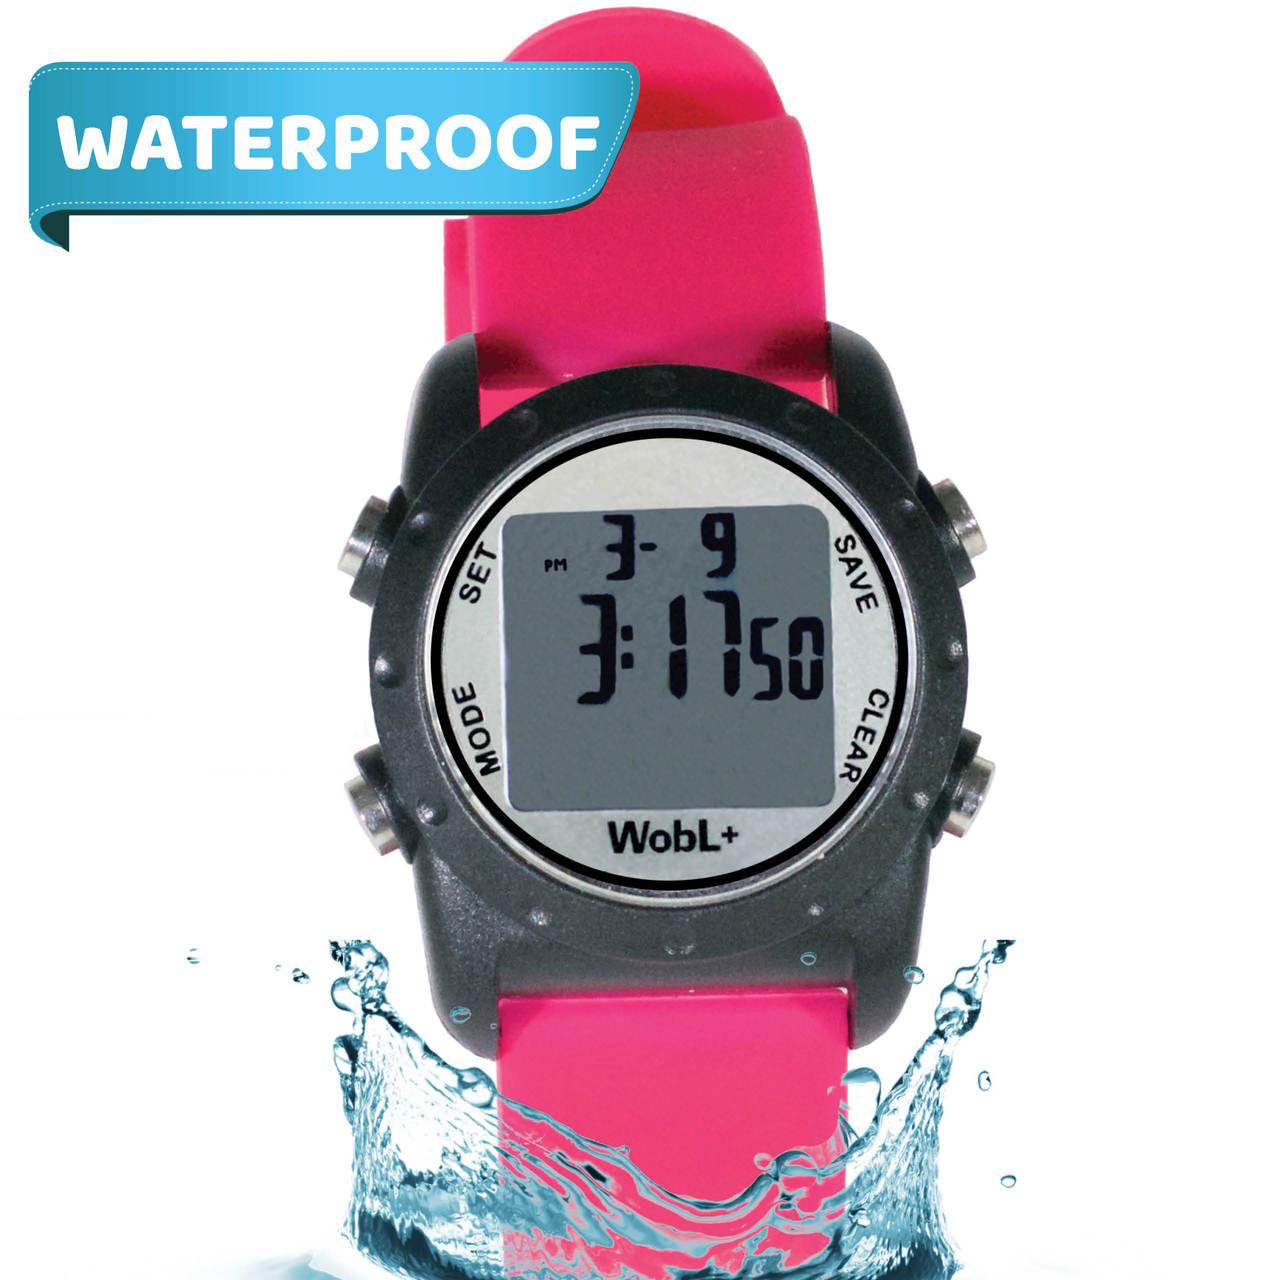 wobl potty watch instructions